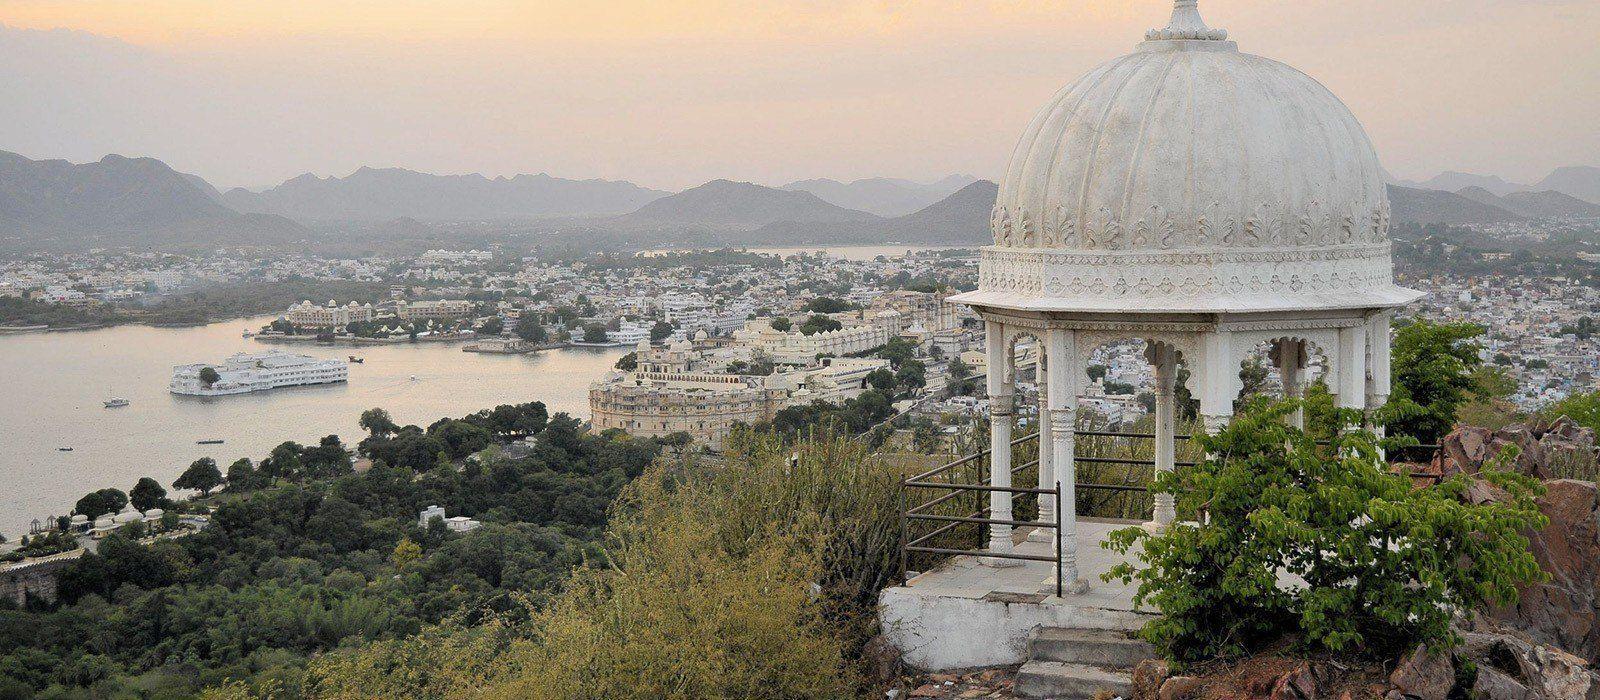 Rajasthan's Jewels and Secrets Tour Trip 4